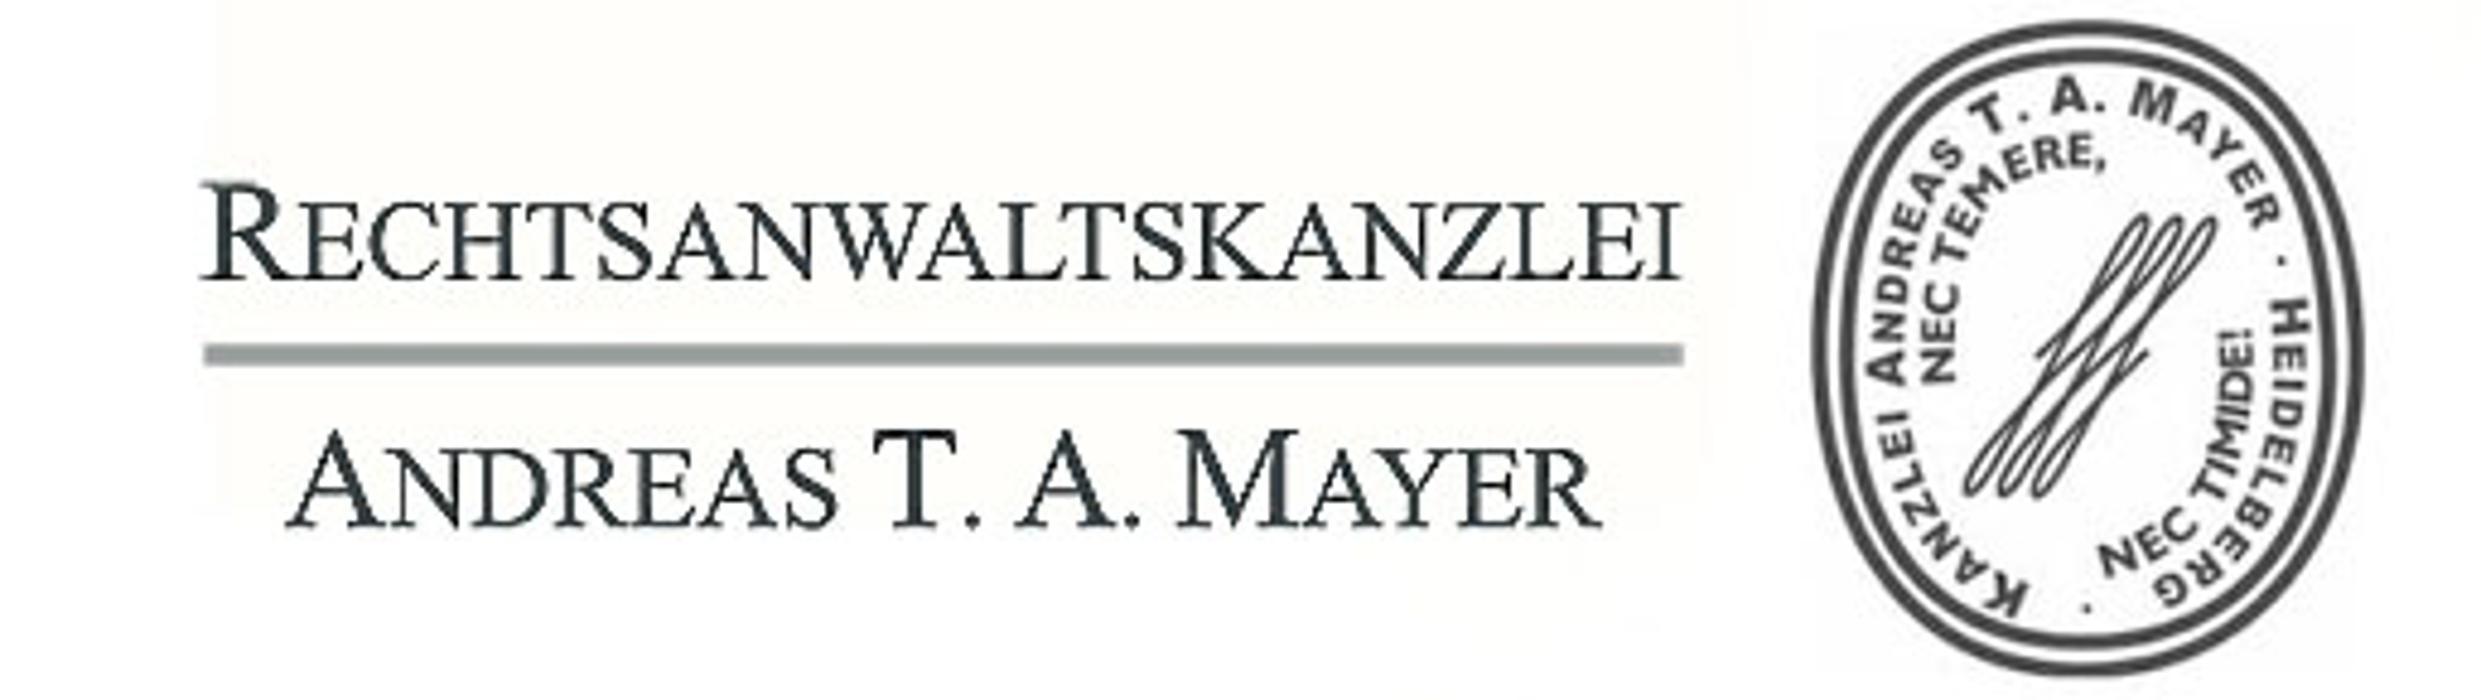 Bild zu Andreas T. A. Mayer Rechtsanwaltskanzlei in Heidelberg